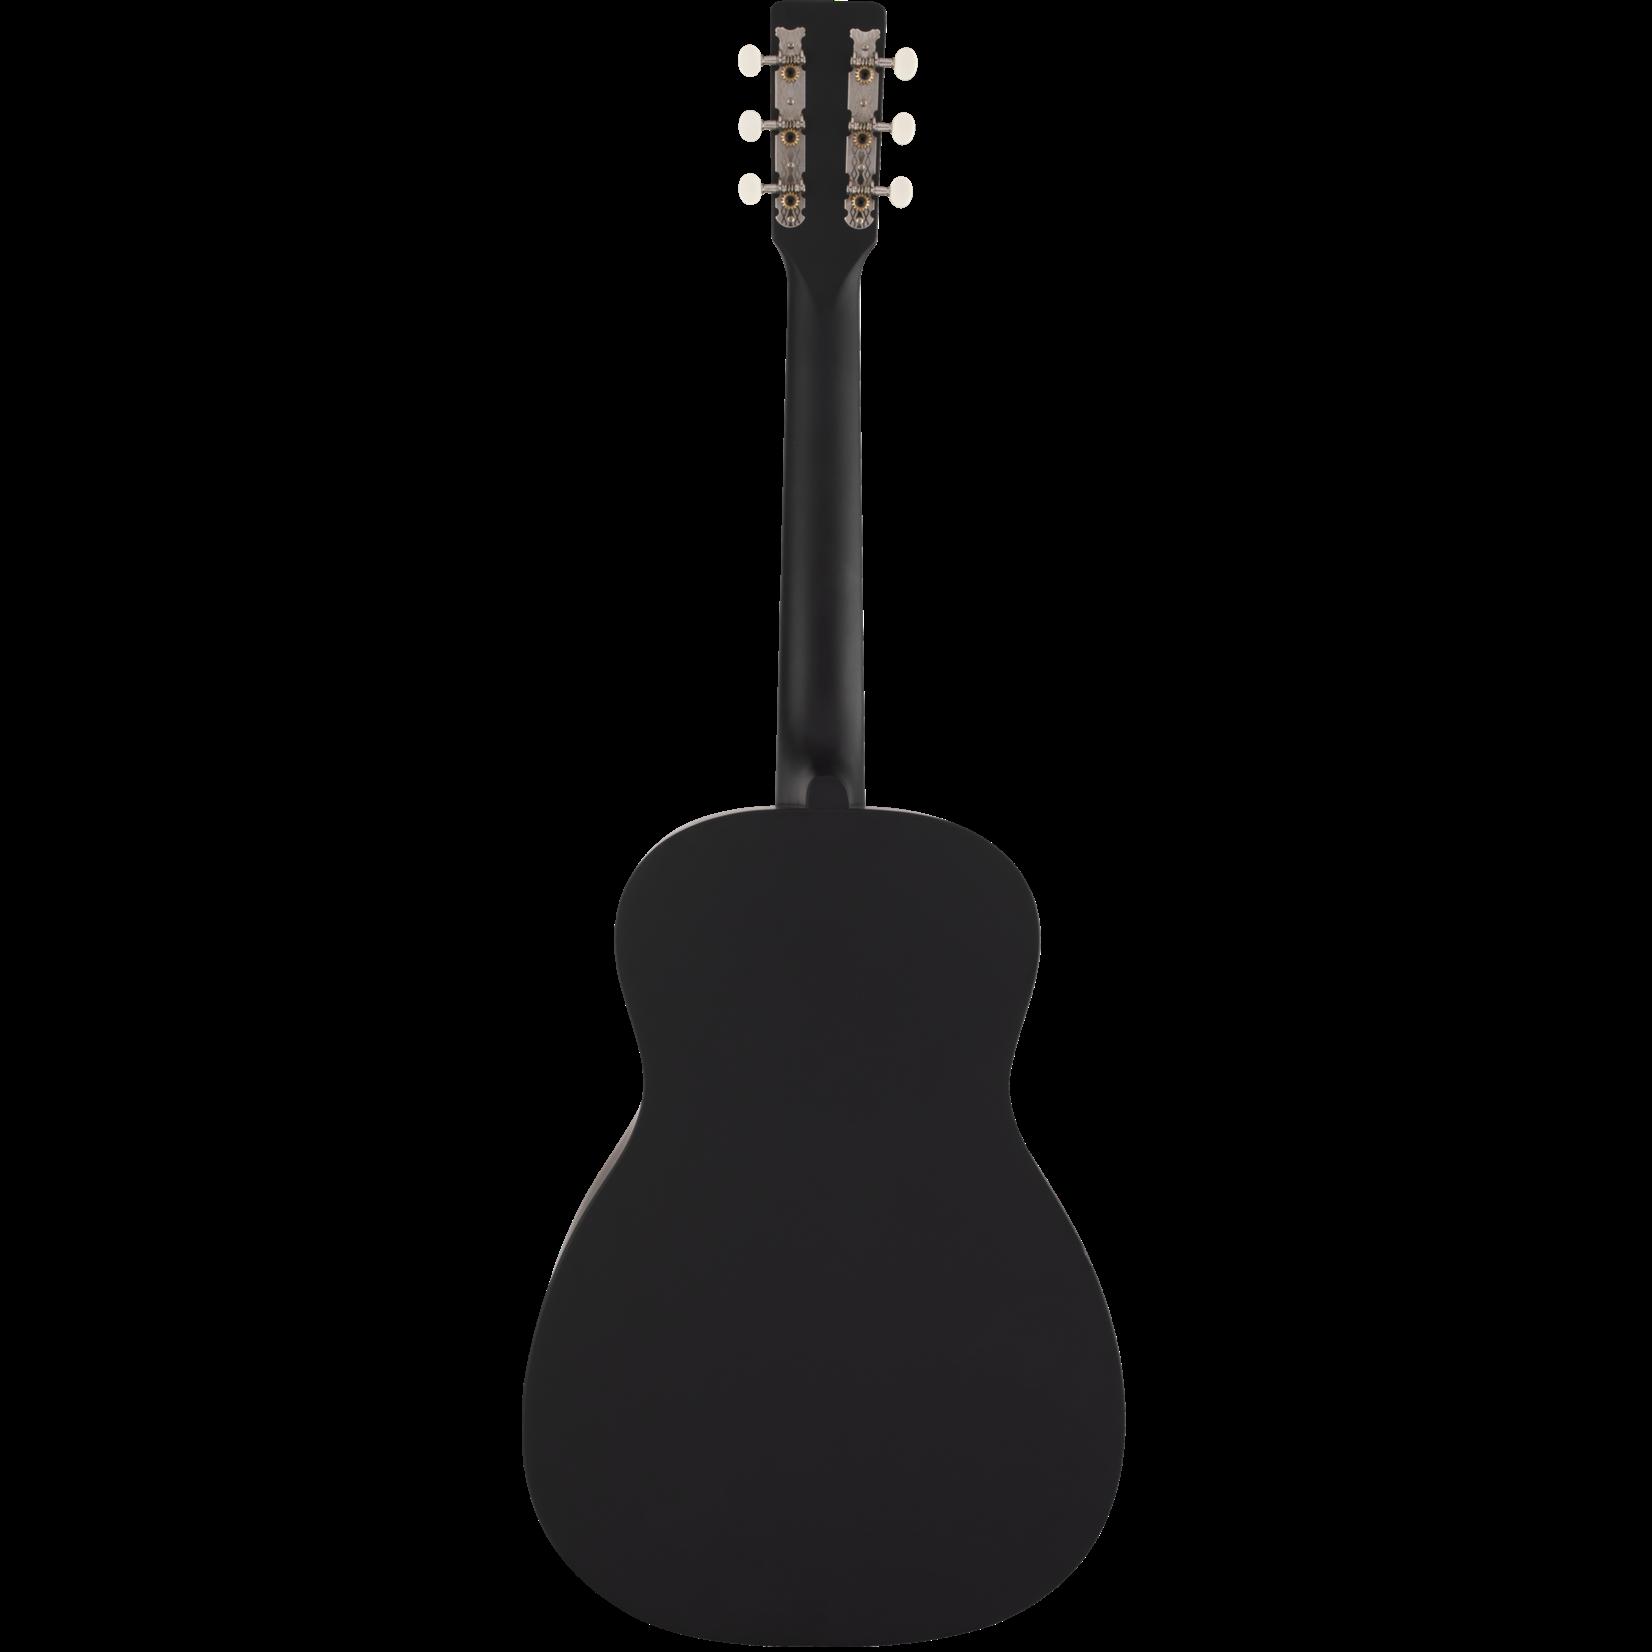 Gretsch Gretsch G9500 Jim Dandy 24 Inch Flat Top Acoustic Guitar